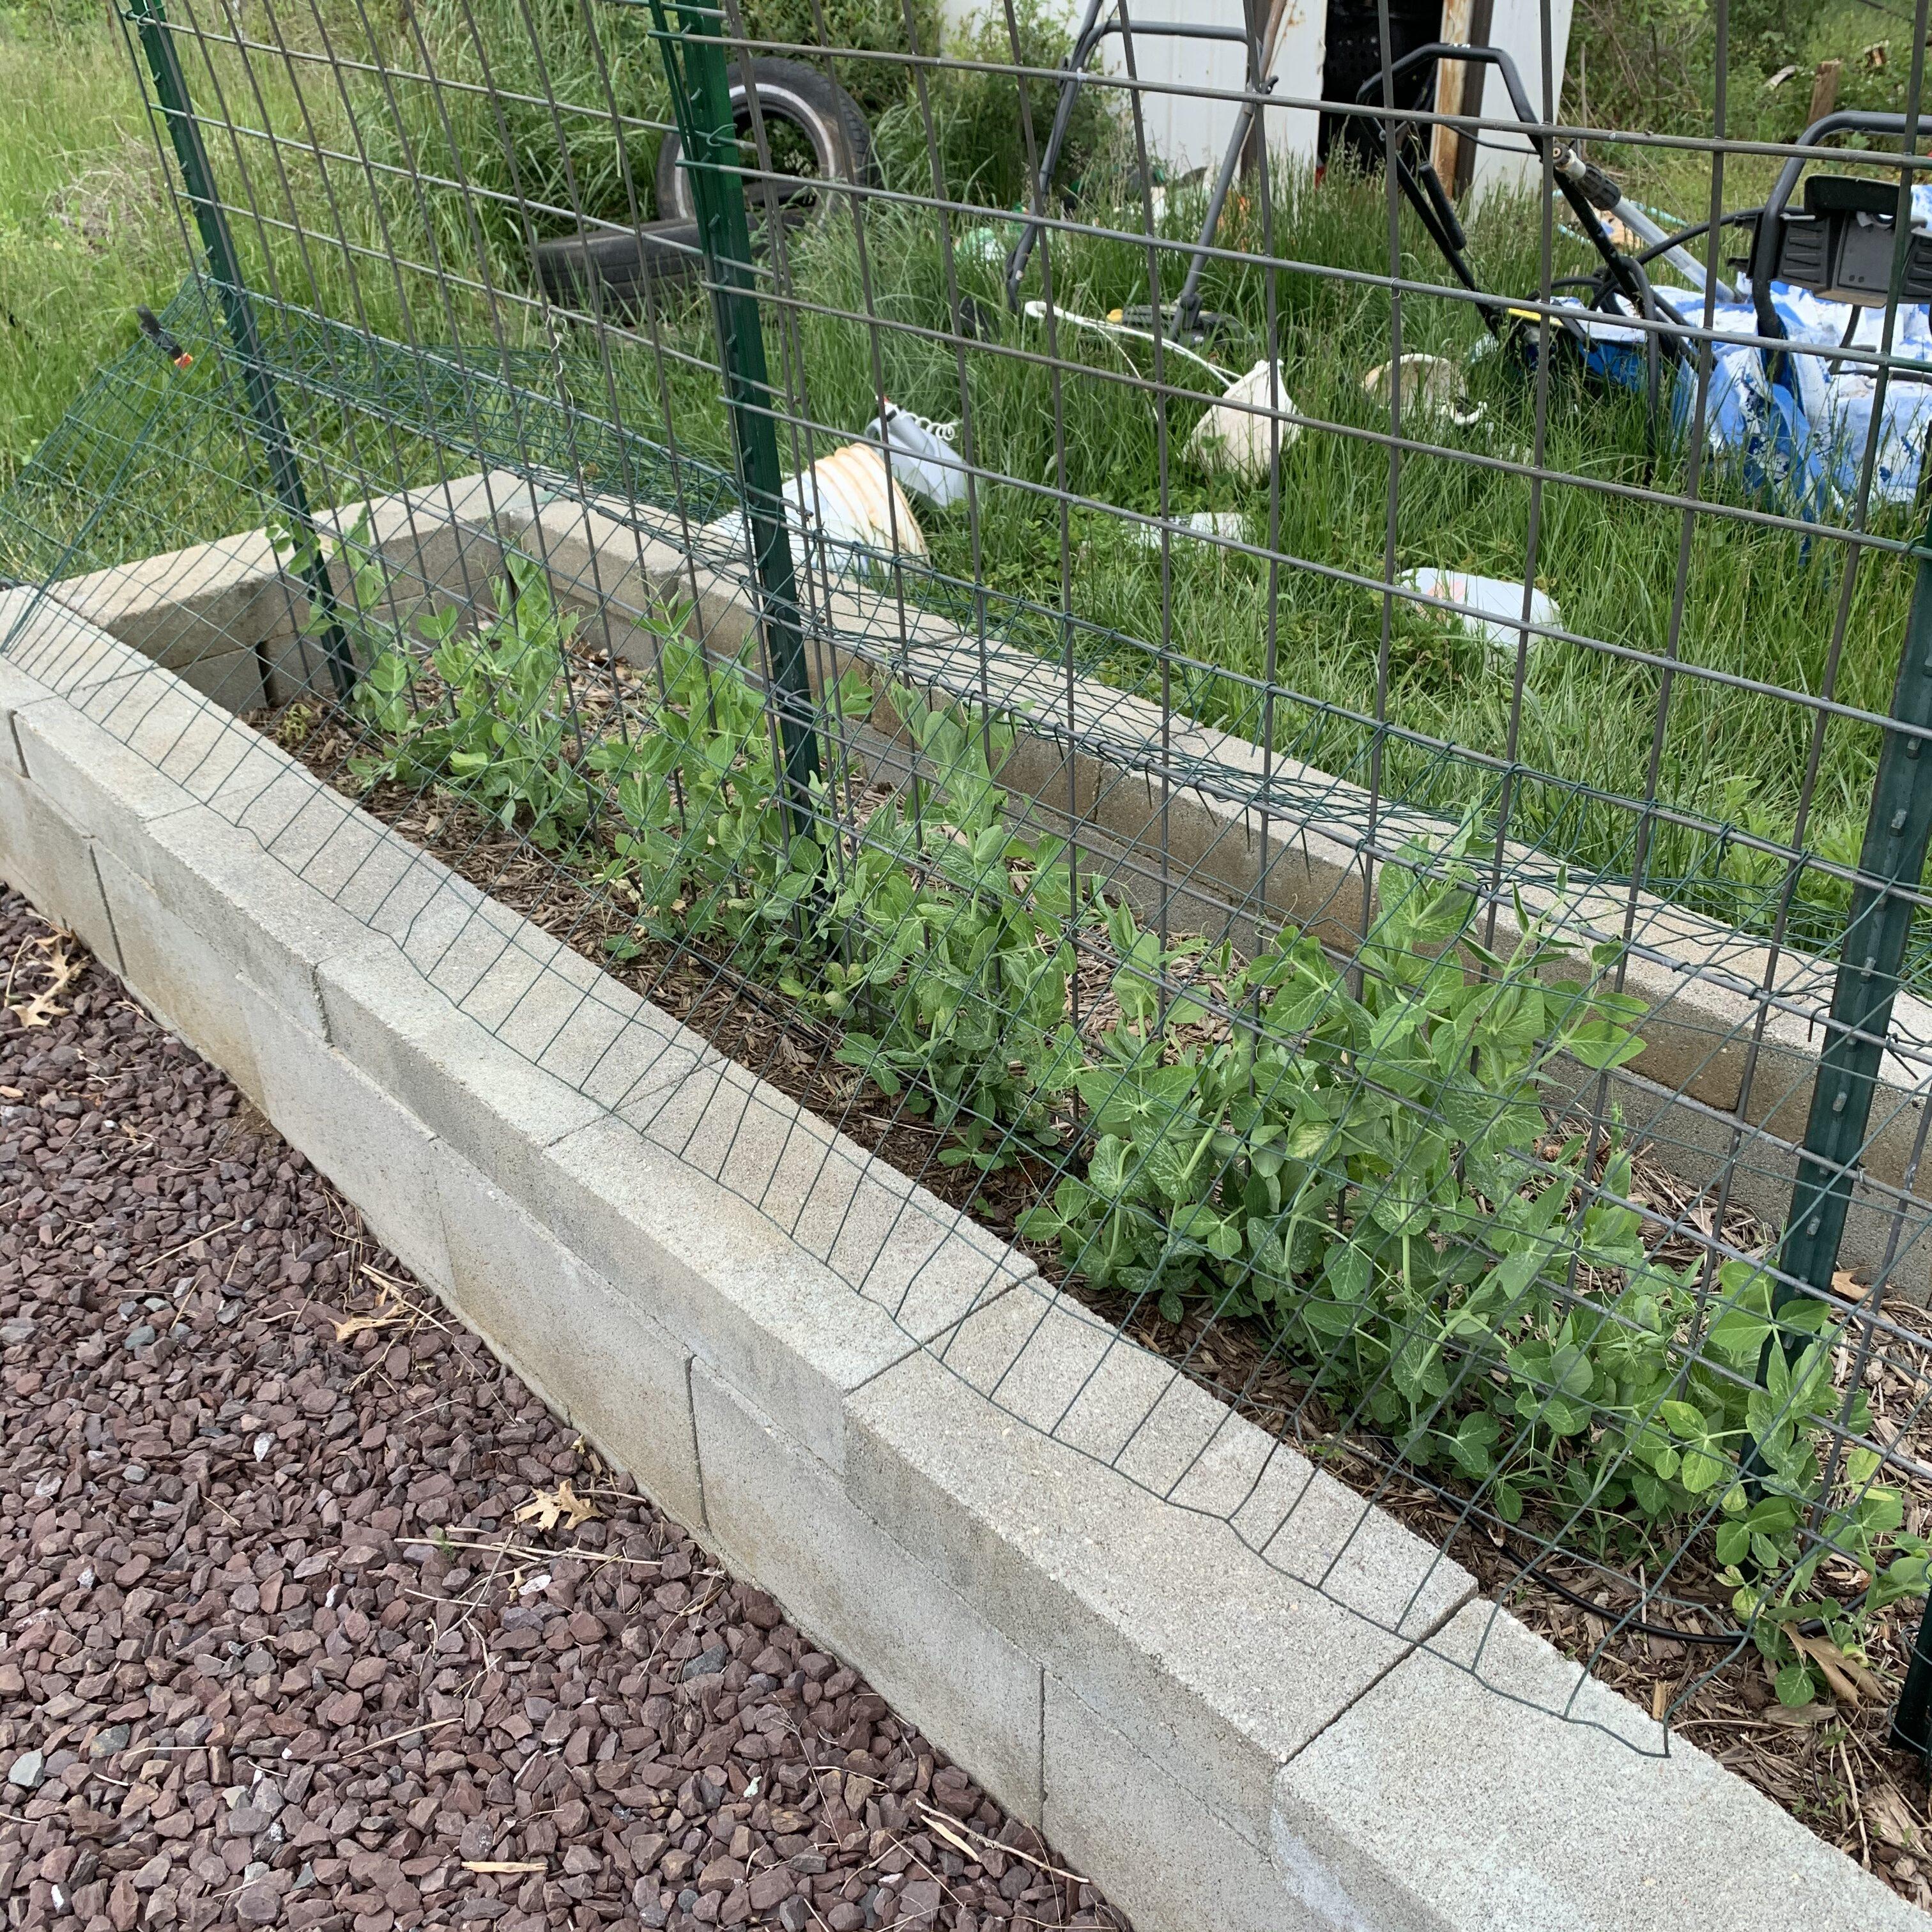 B6B6E704 7818 4BE7 8606 C16B61FCFC79 Tomato planting day!